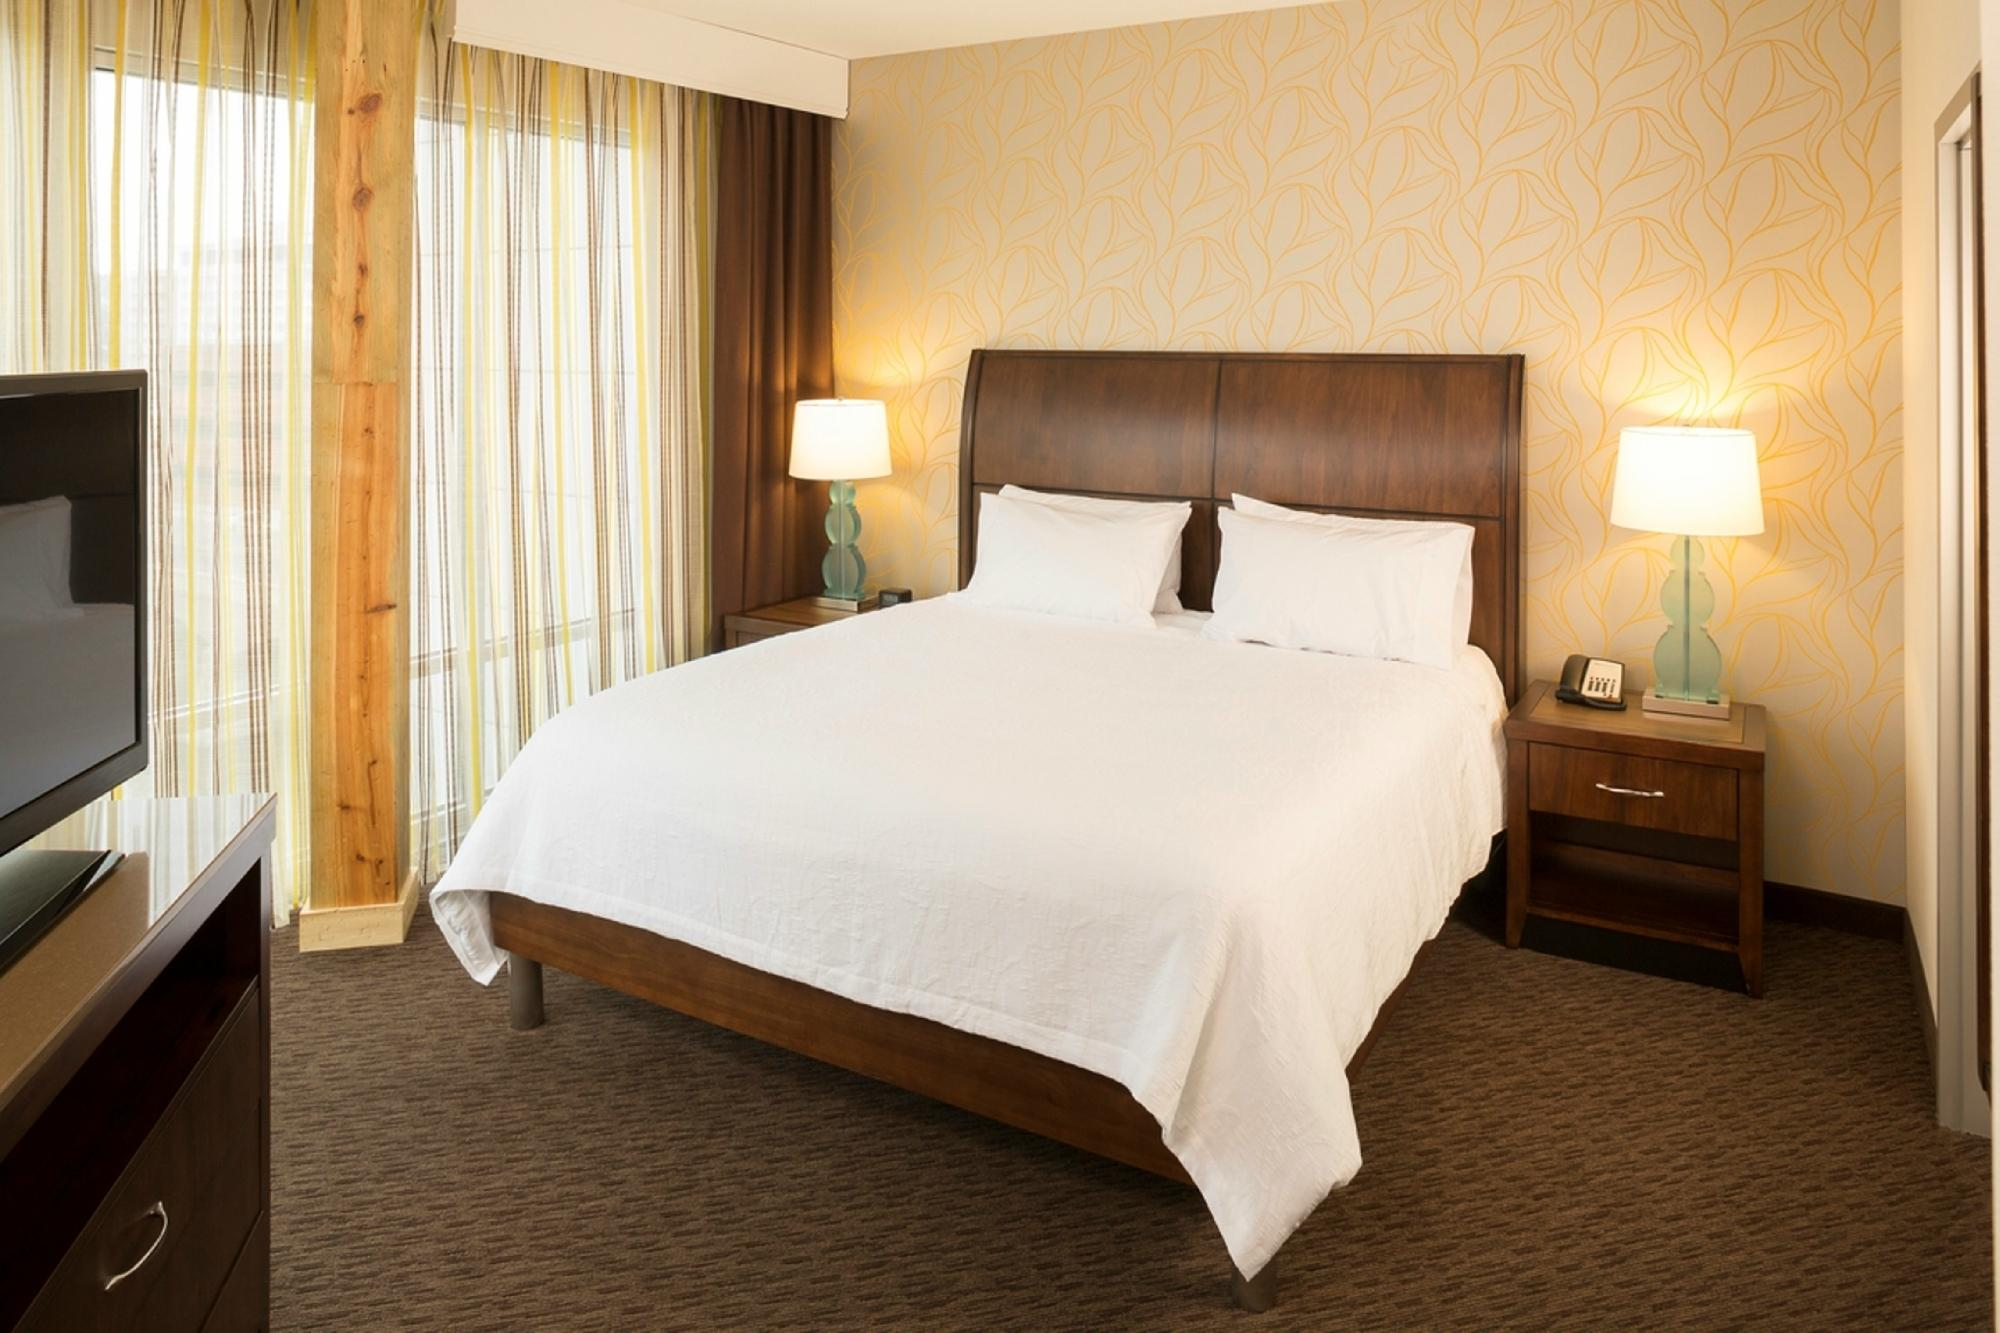 hilton garden inn downtown sioux falls sd 2017 hotel review